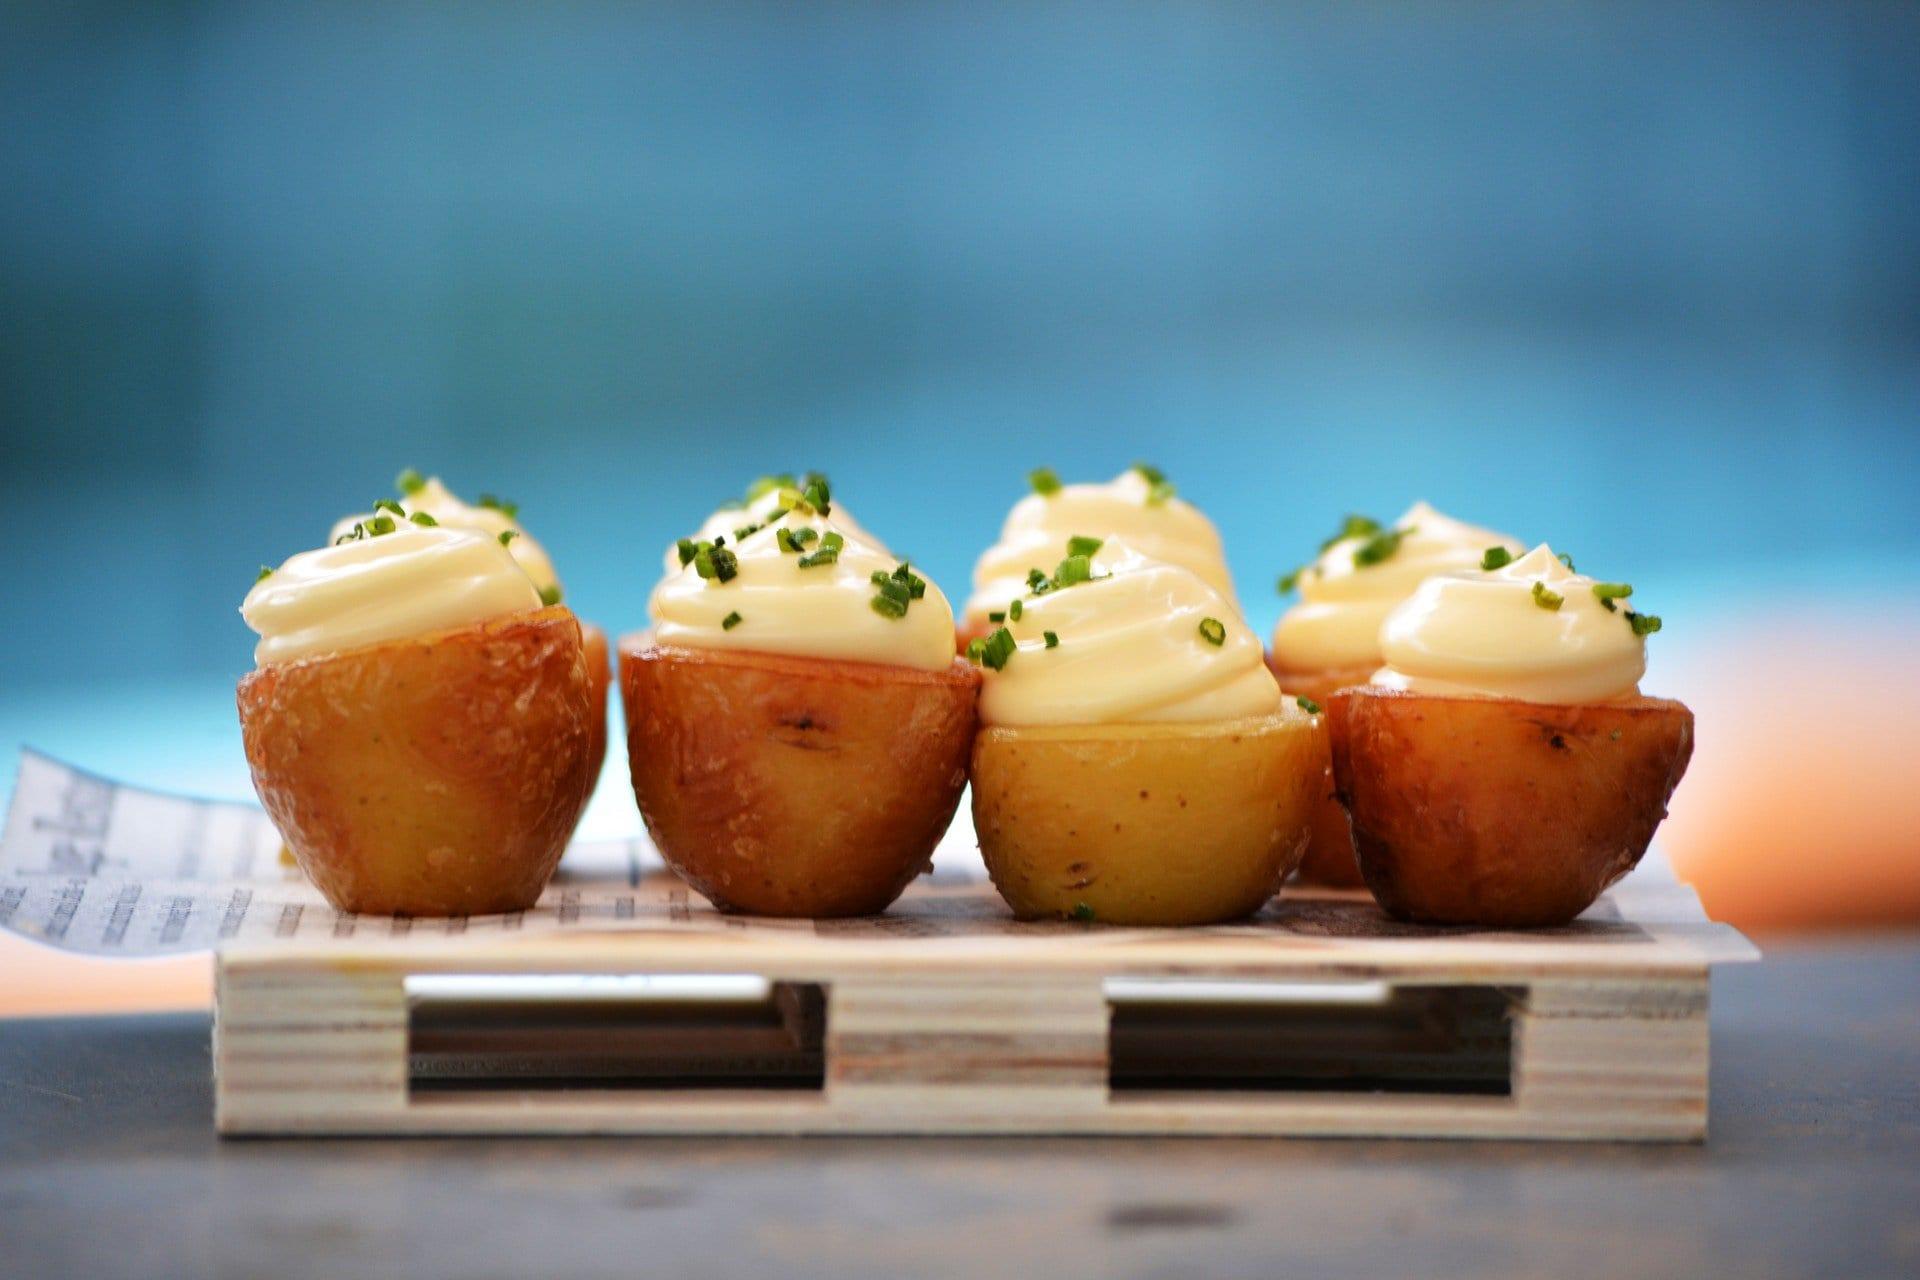 Receta de patatasasadasconcrema de queso